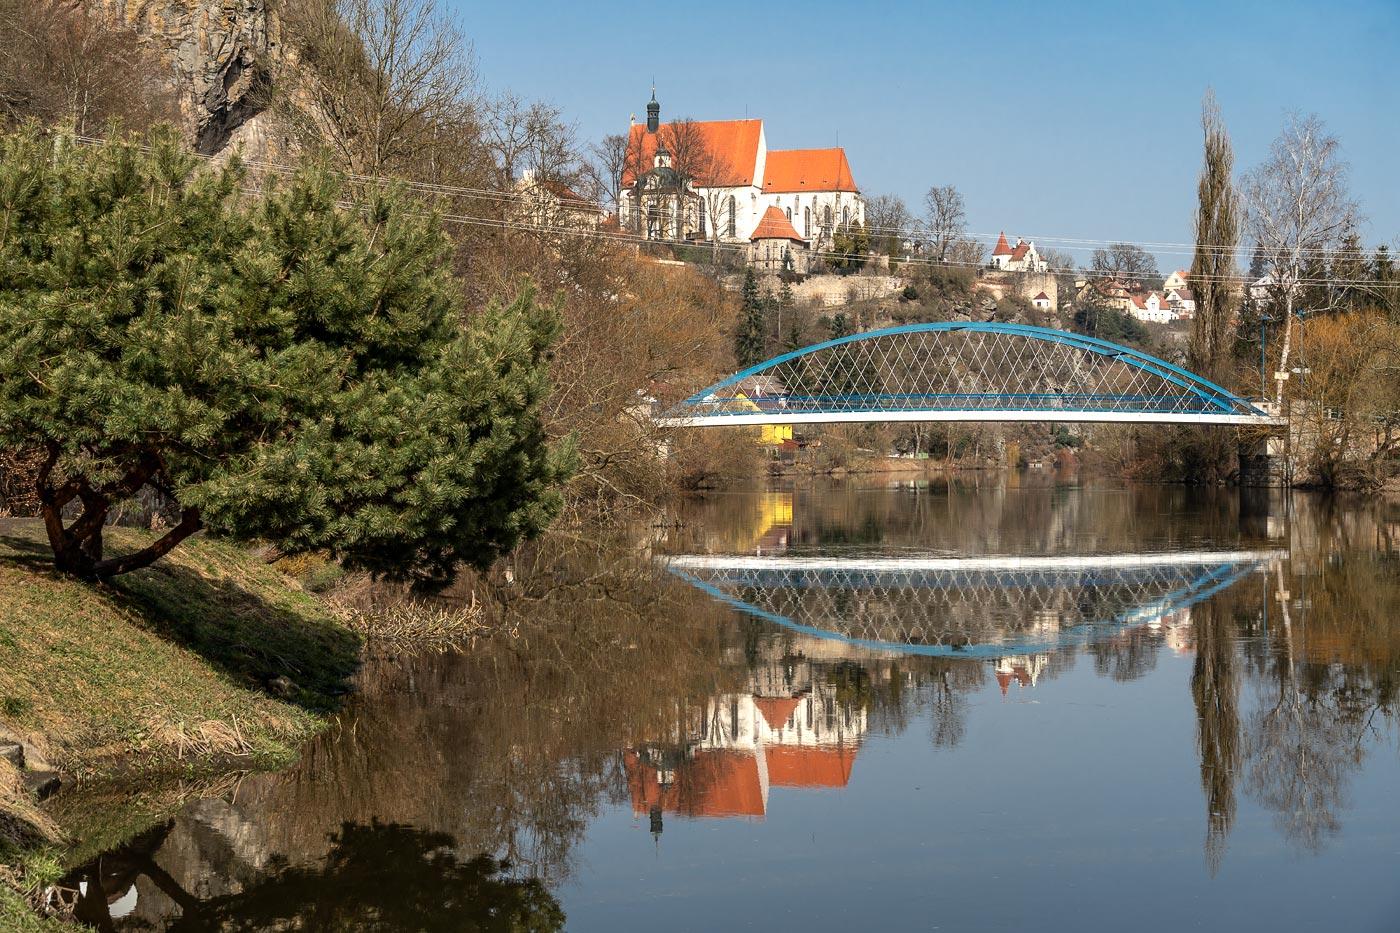 Мост через реку Лужнице